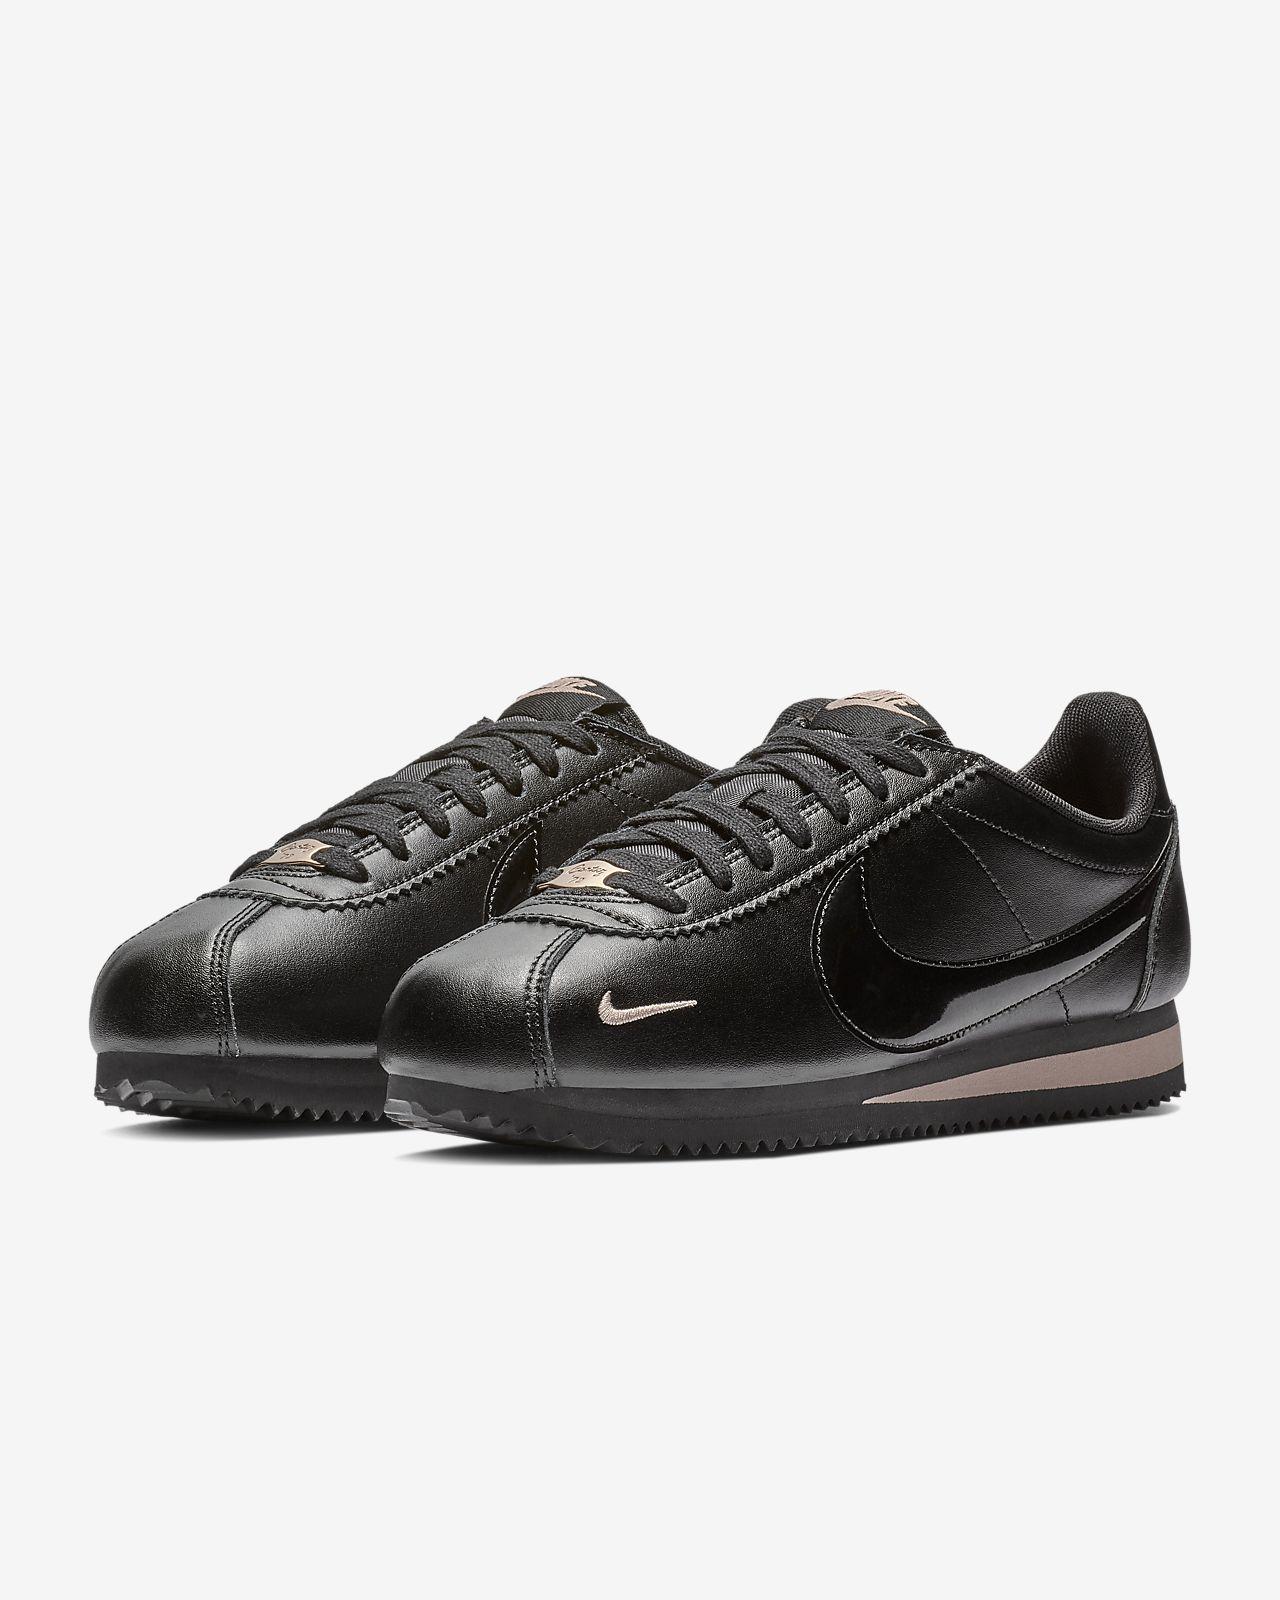 0d47642524ba Nike Classic Cortez Premium Women s Shoe. Nike.com